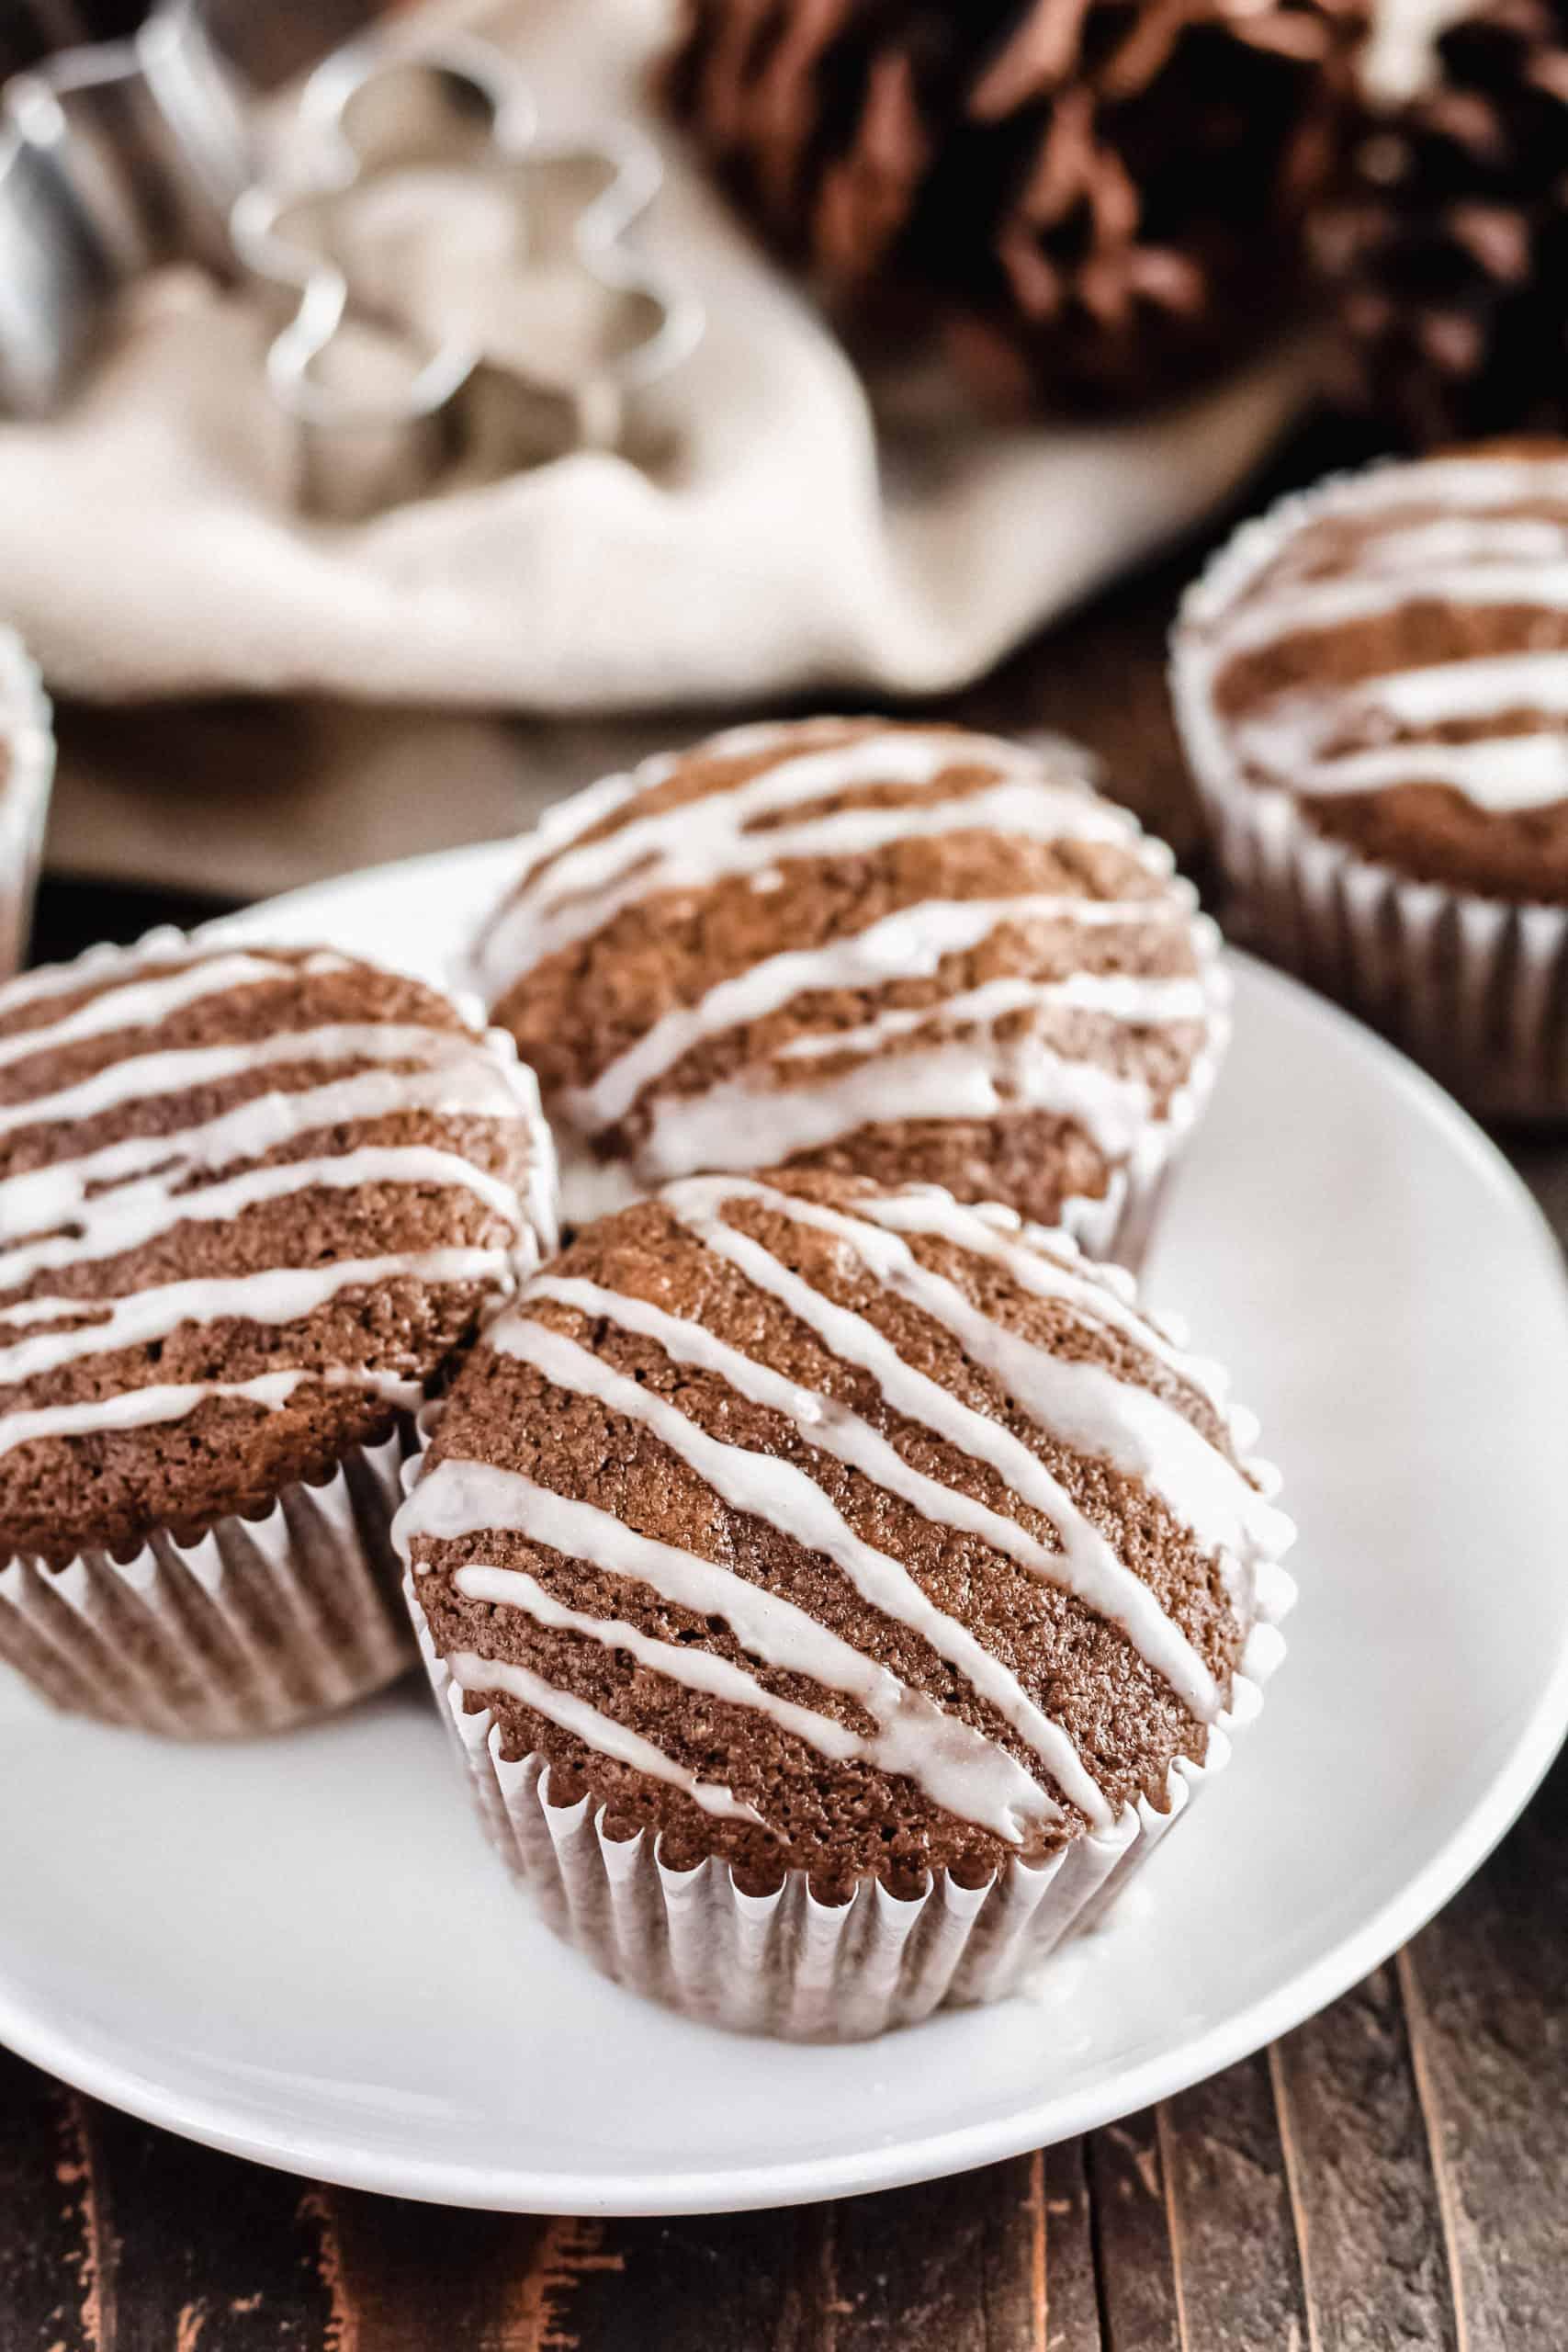 Gingerbread Muffins Gluten Free Whole Grain Low Sugar With Maple Vanilla Glaze